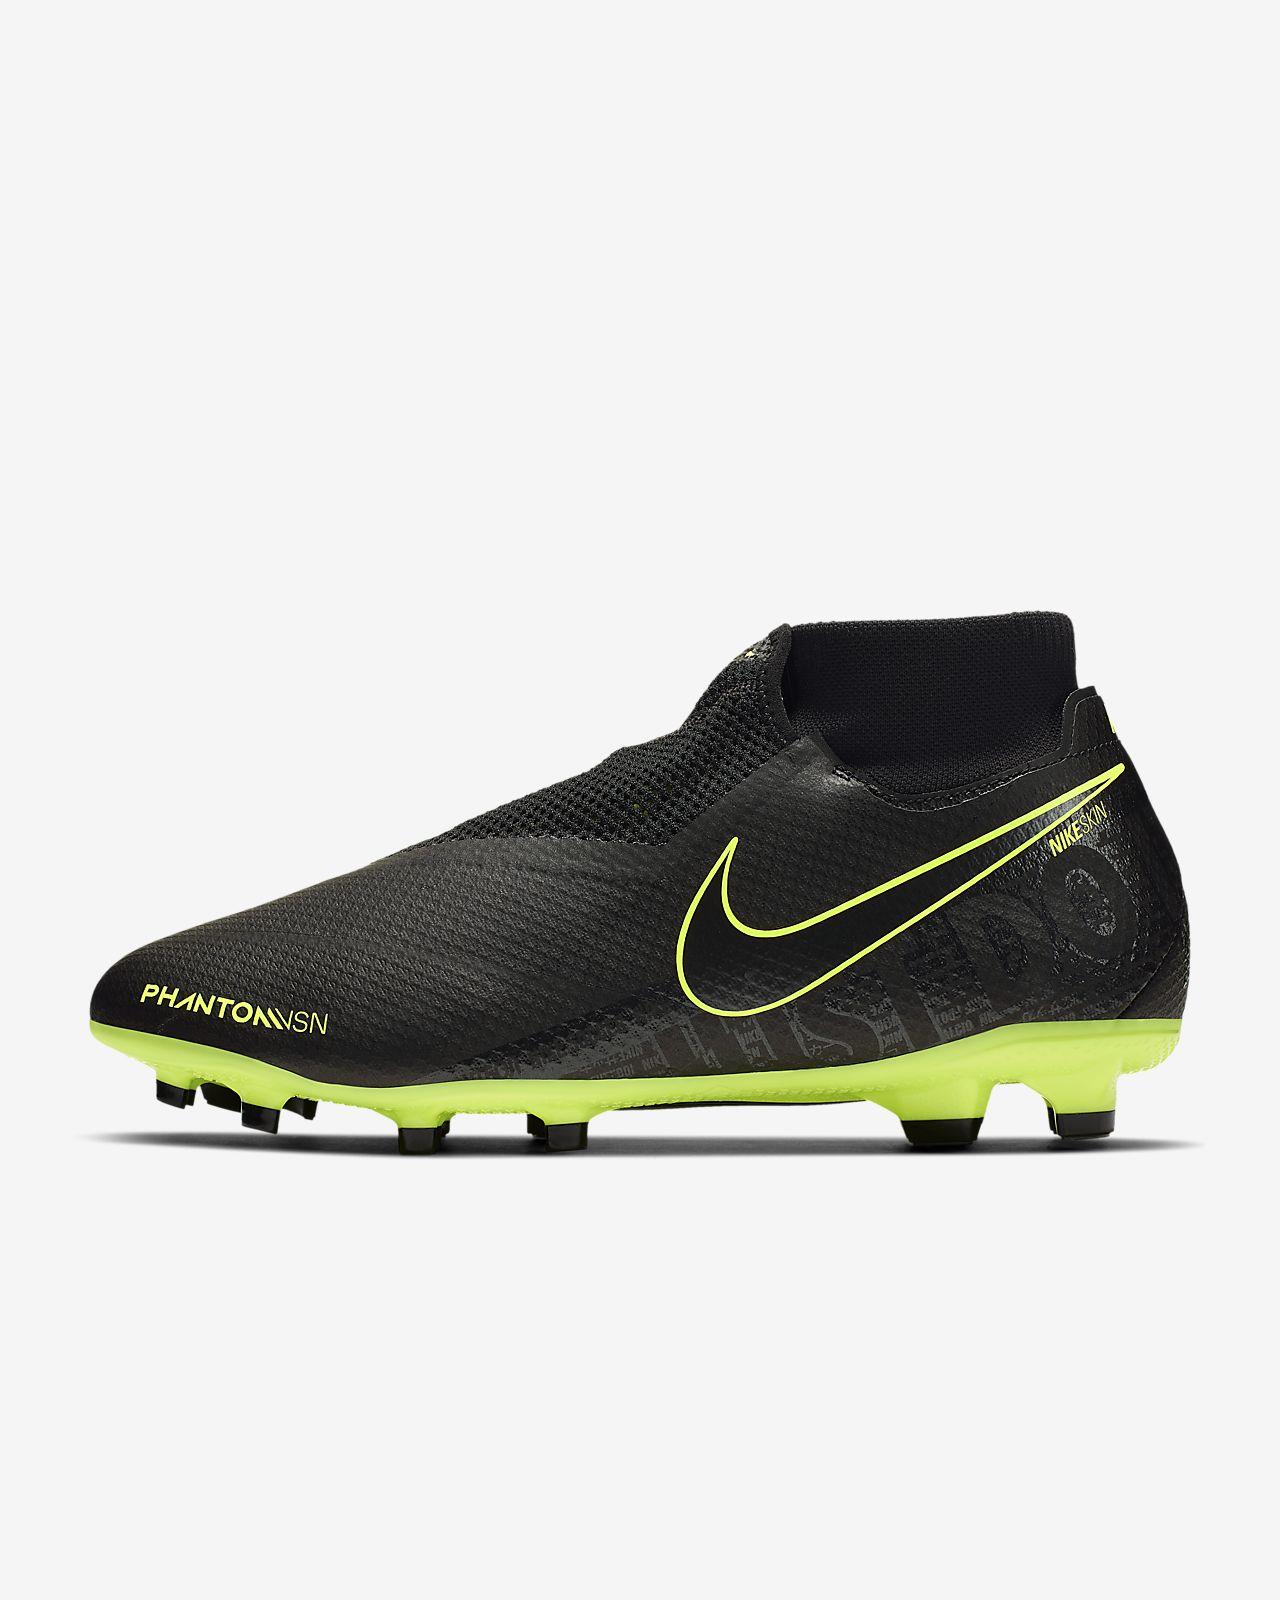 Fit Fg Vision Football Phantom Pour Dynamic À Nike Terrain Pro Sec Chaussure De Crampons mvwON8n0